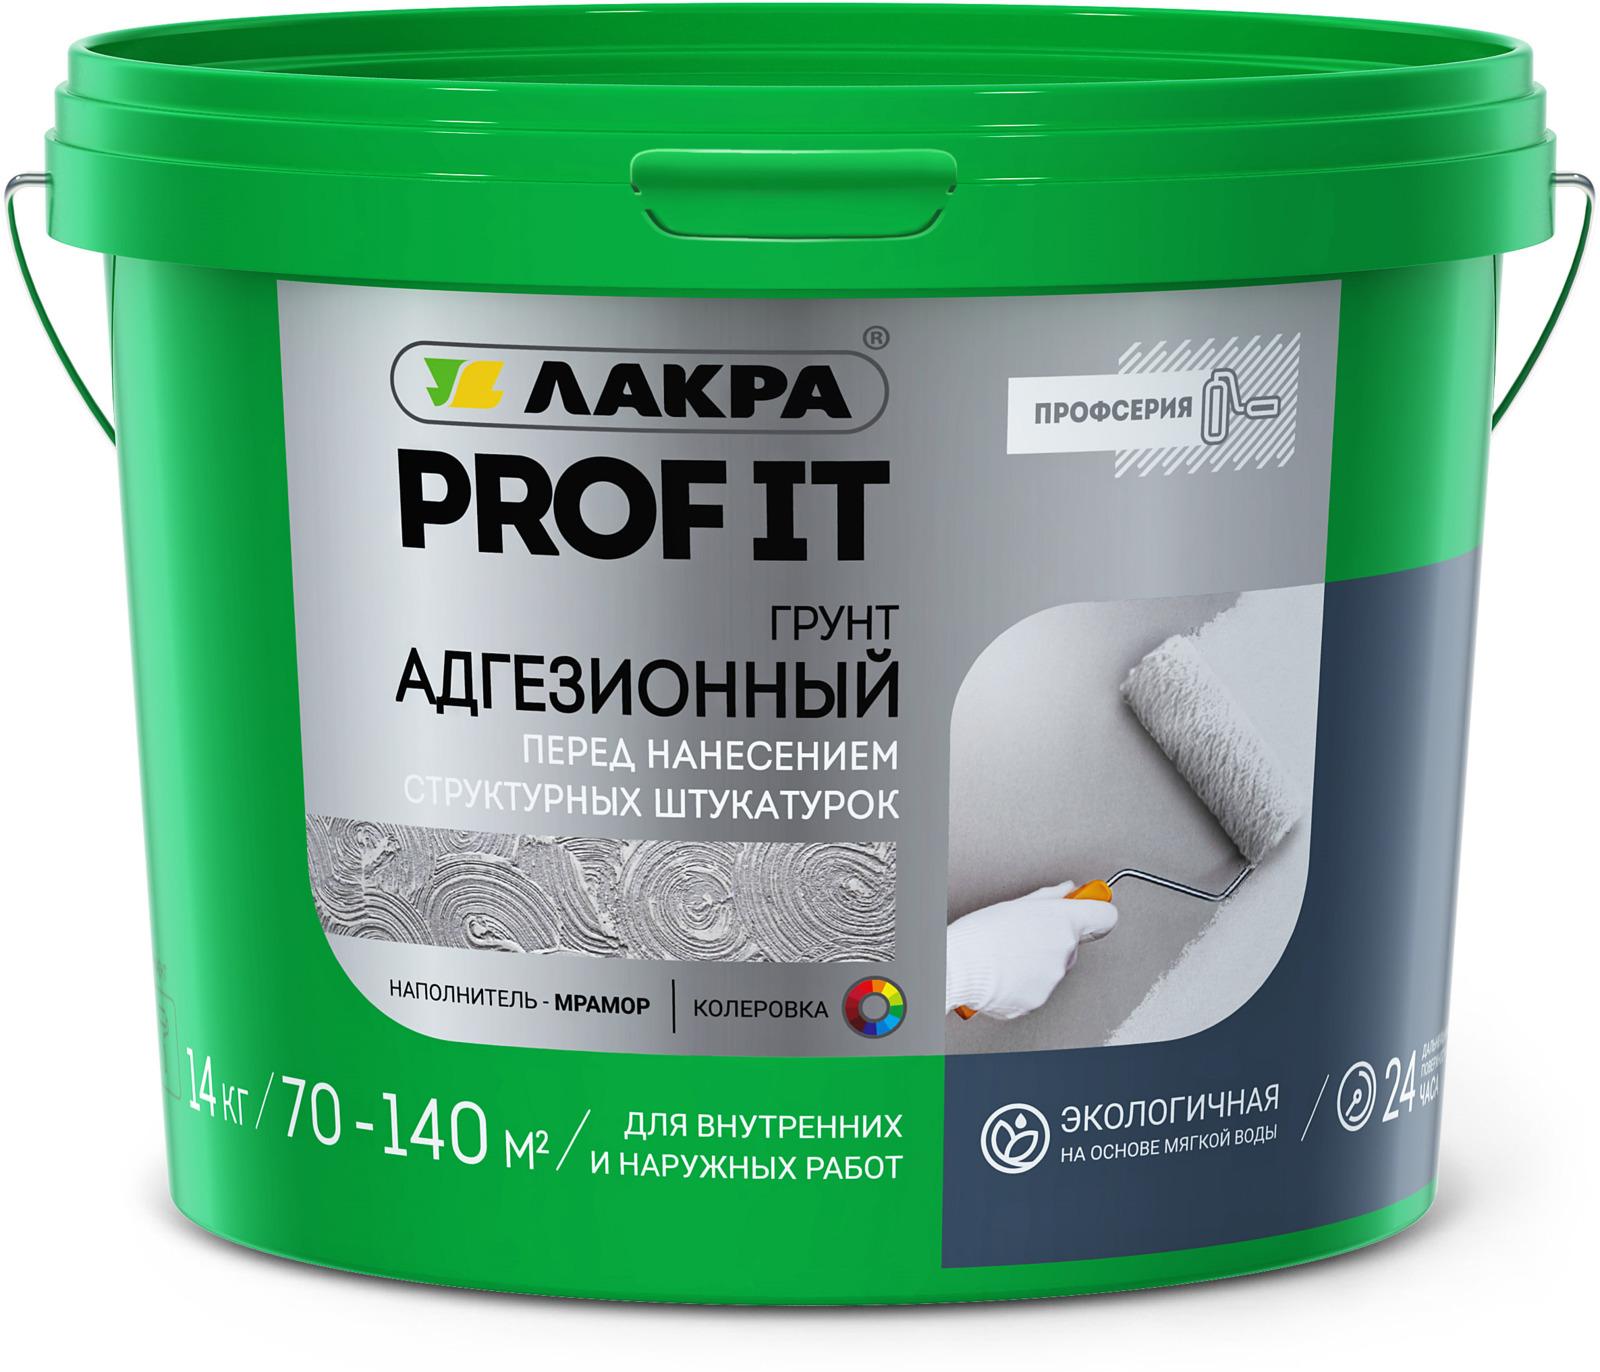 Грунтовка Prof It, адгезионная, белый, 14 кг цена 2017